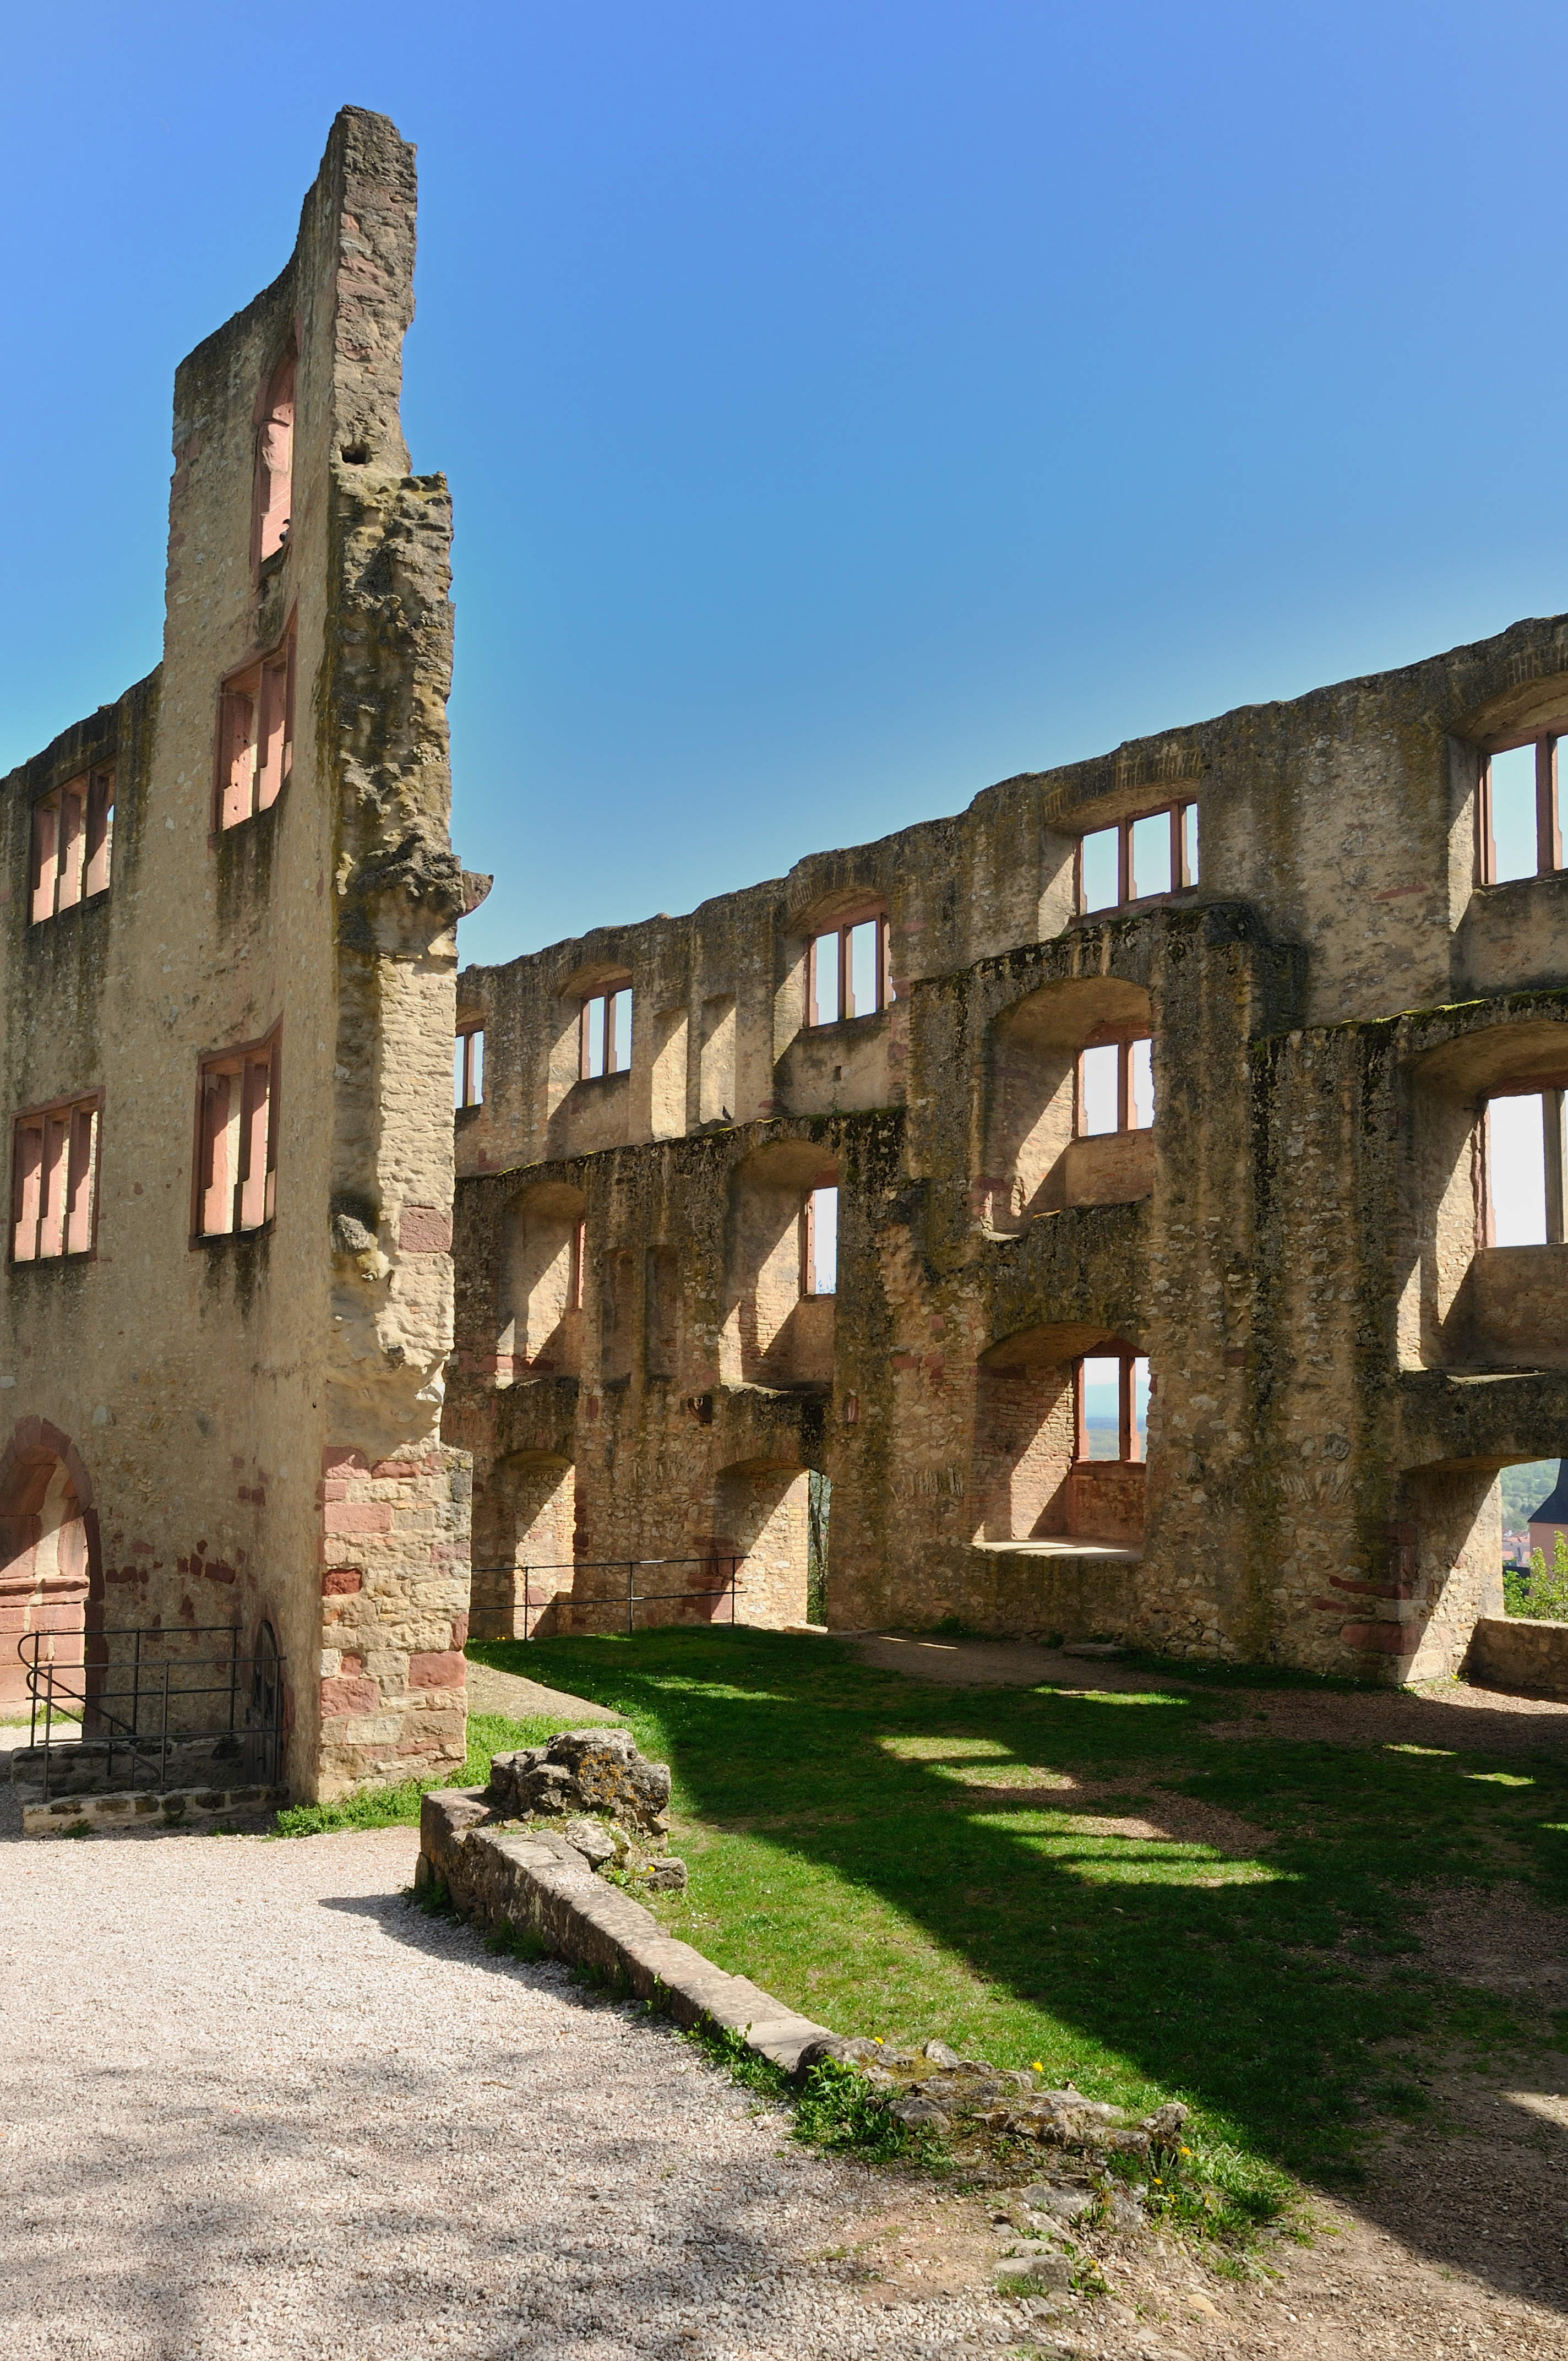 Seecamping & Pension Mentl, Landskron, Austria - rockmartonline.com